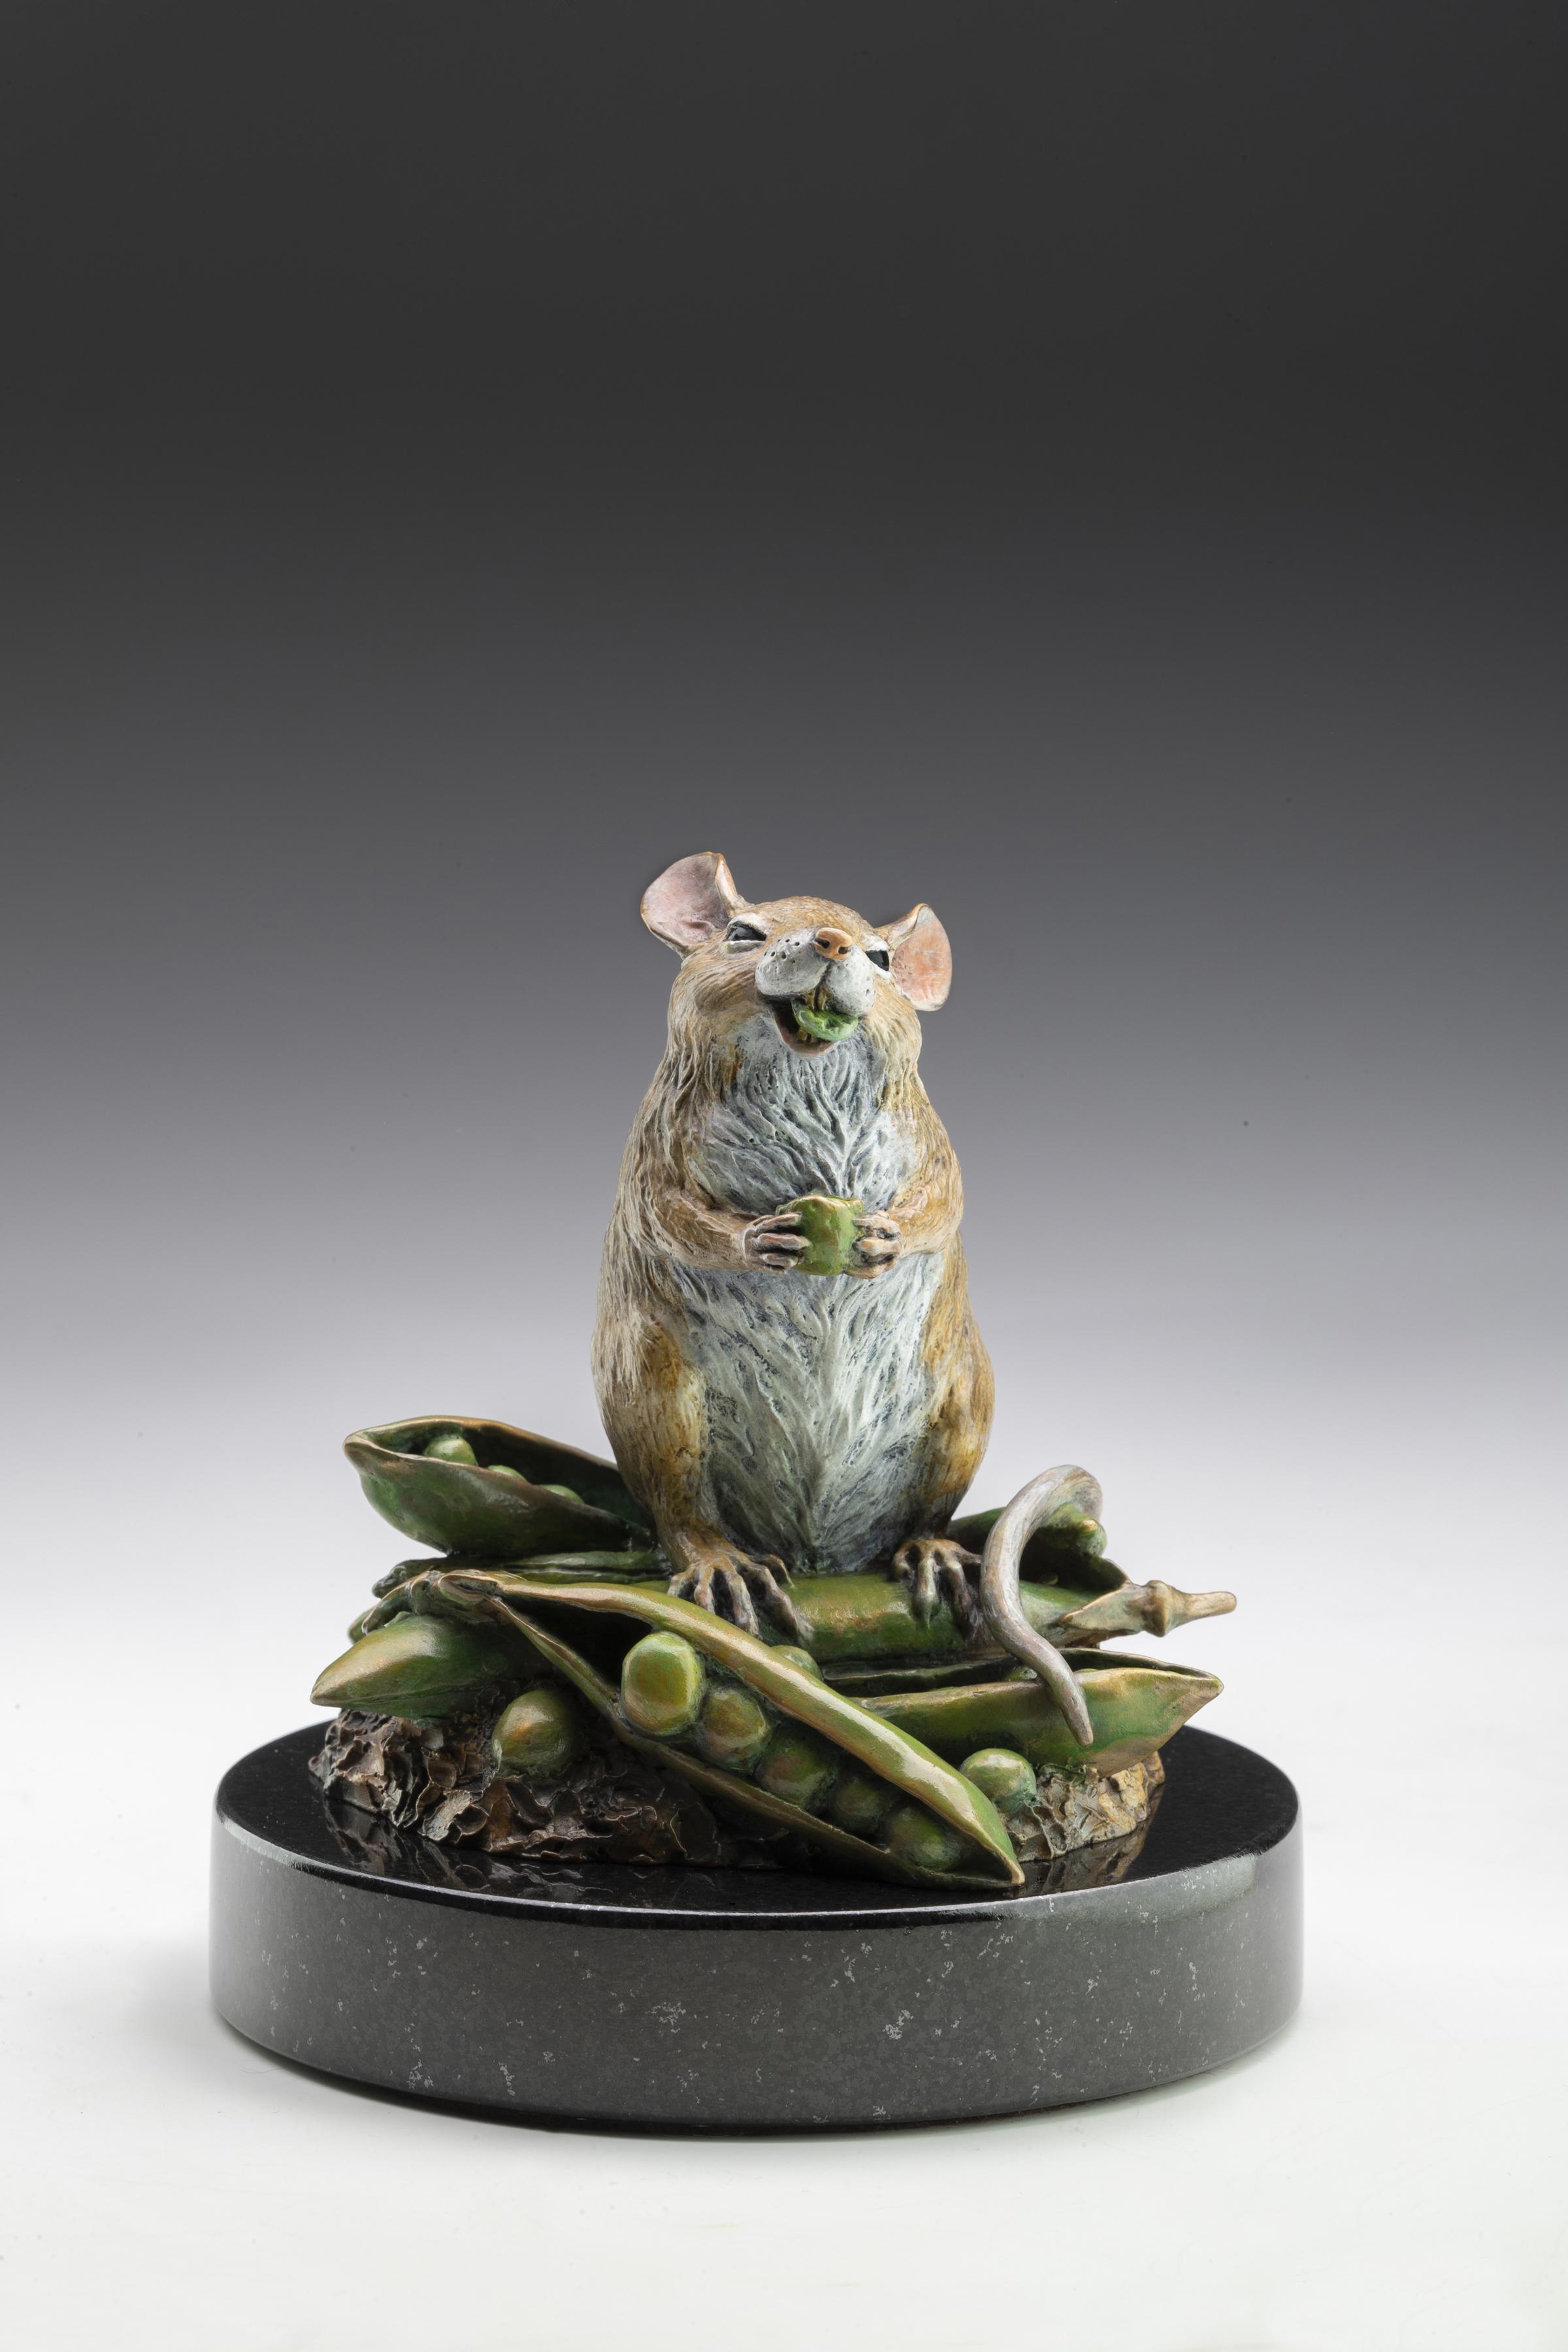 "Peas Prize | 4.75"" x 4.5"" x 4.5"" | Bronze | Edition of 75 | $975"